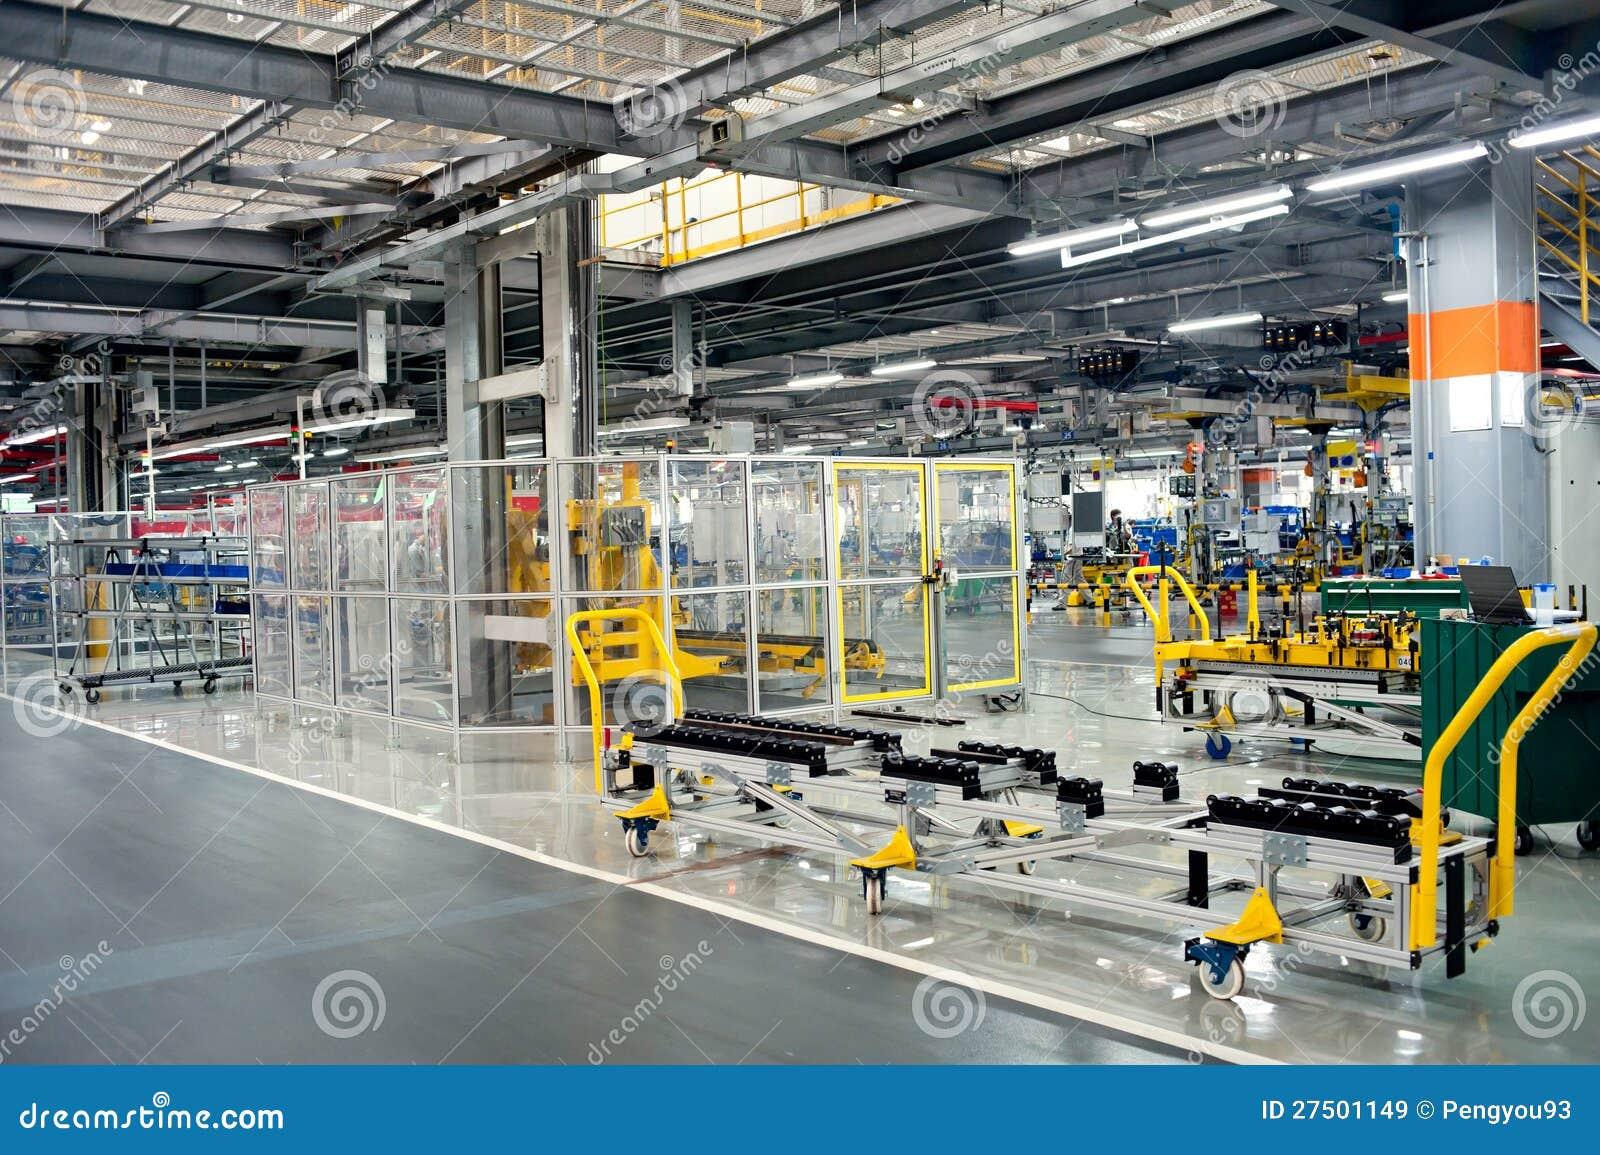 Automobile Assembly Shop Production Line Stock Image